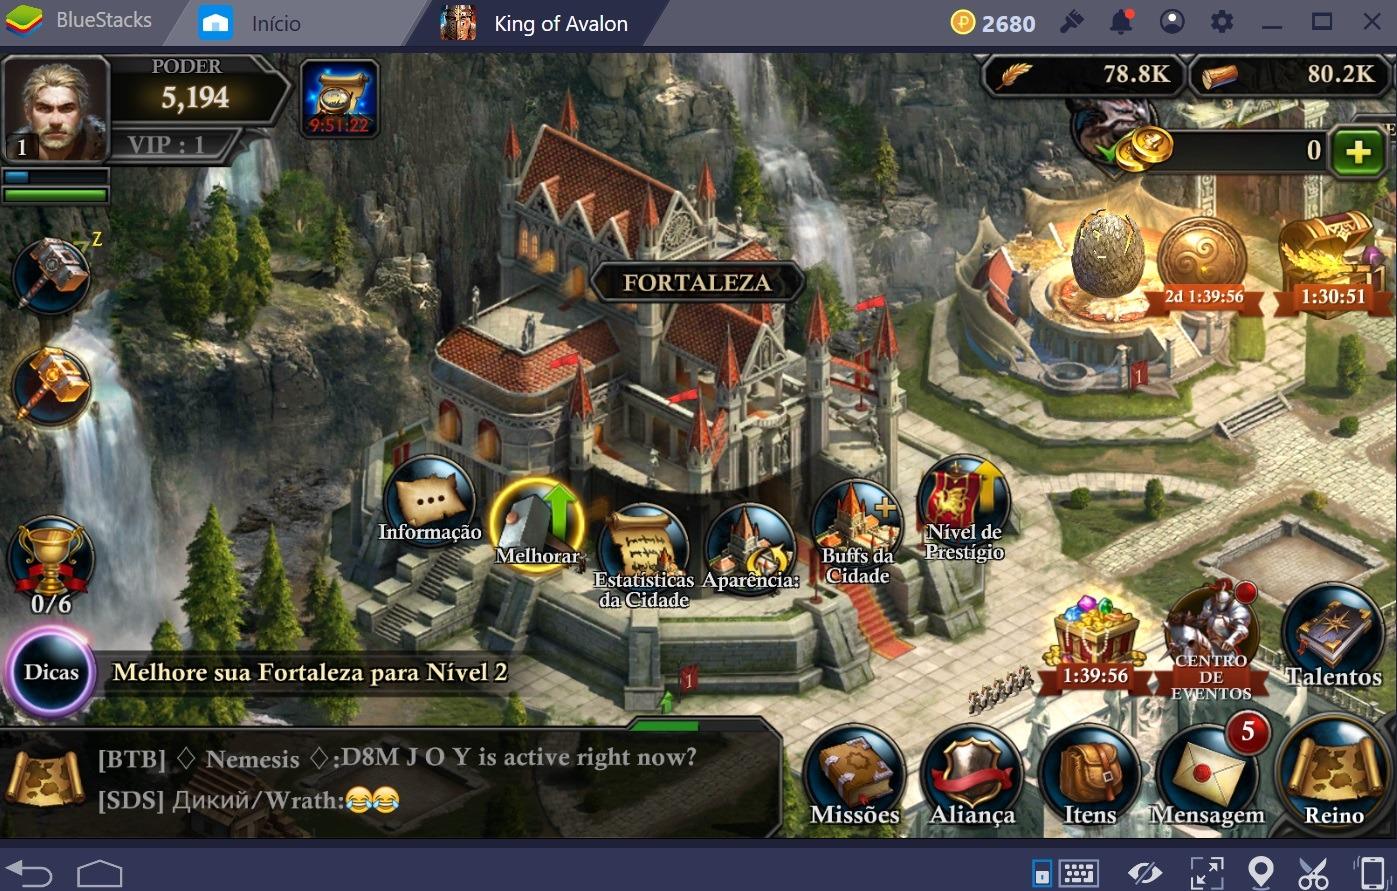 Guia para iniciantes em King of Avalon: Dragon Warfare